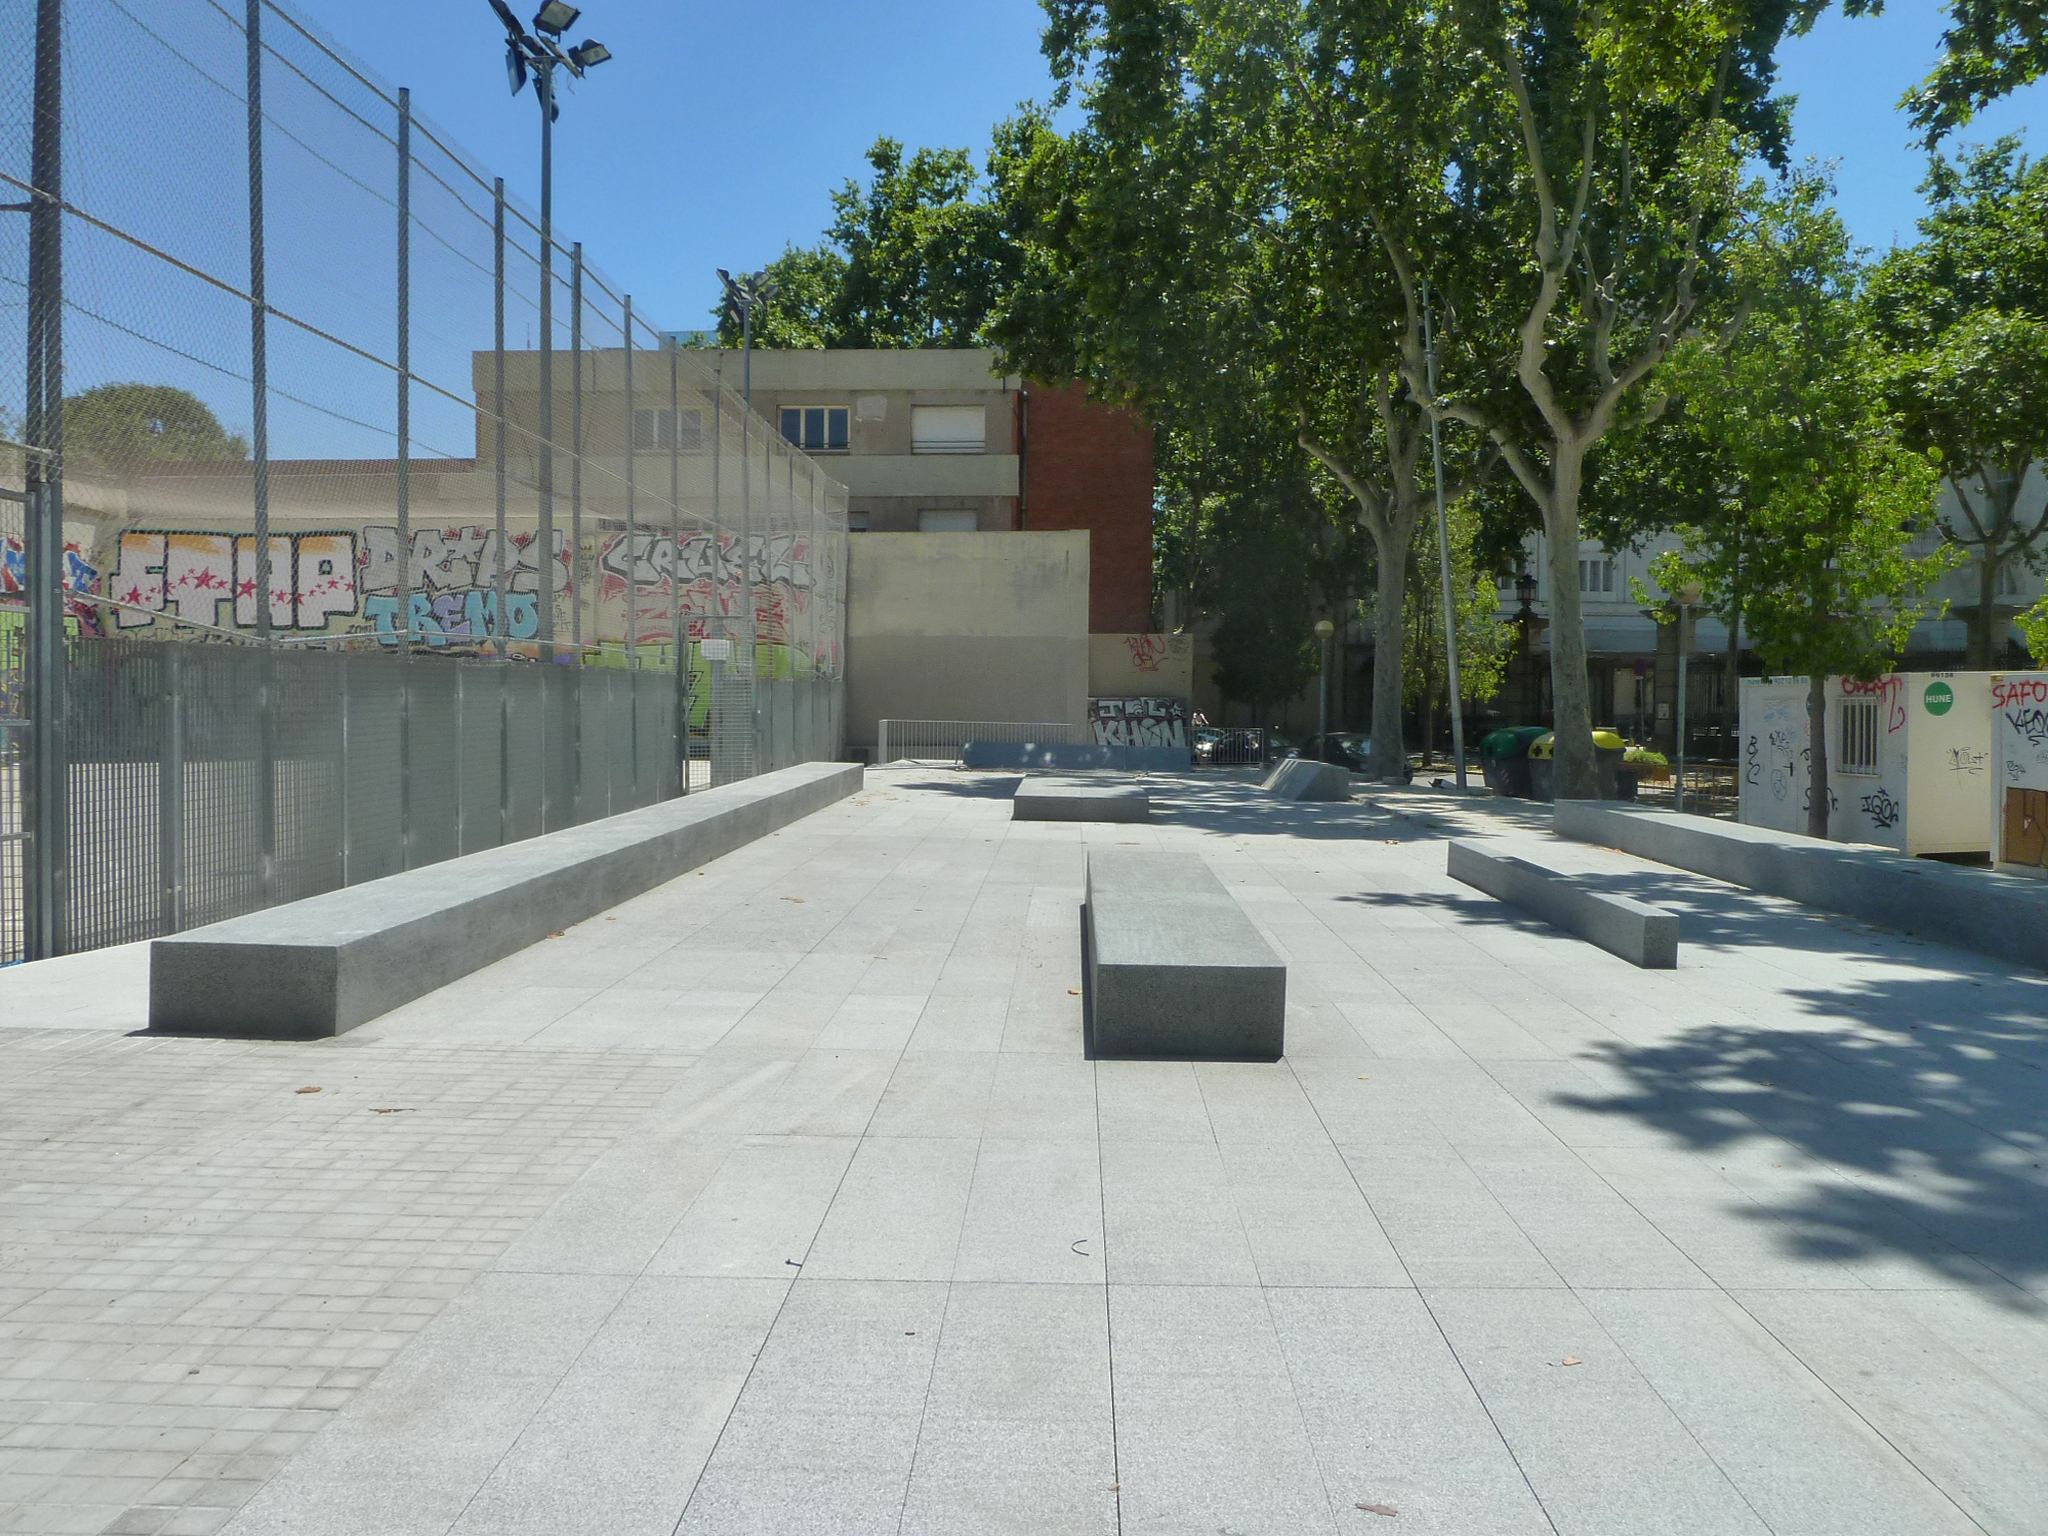 SKATE-ARCHITECTS-BORN-BARCELONA-SKATEPLAZA-PLAZA-P1160287.jpg